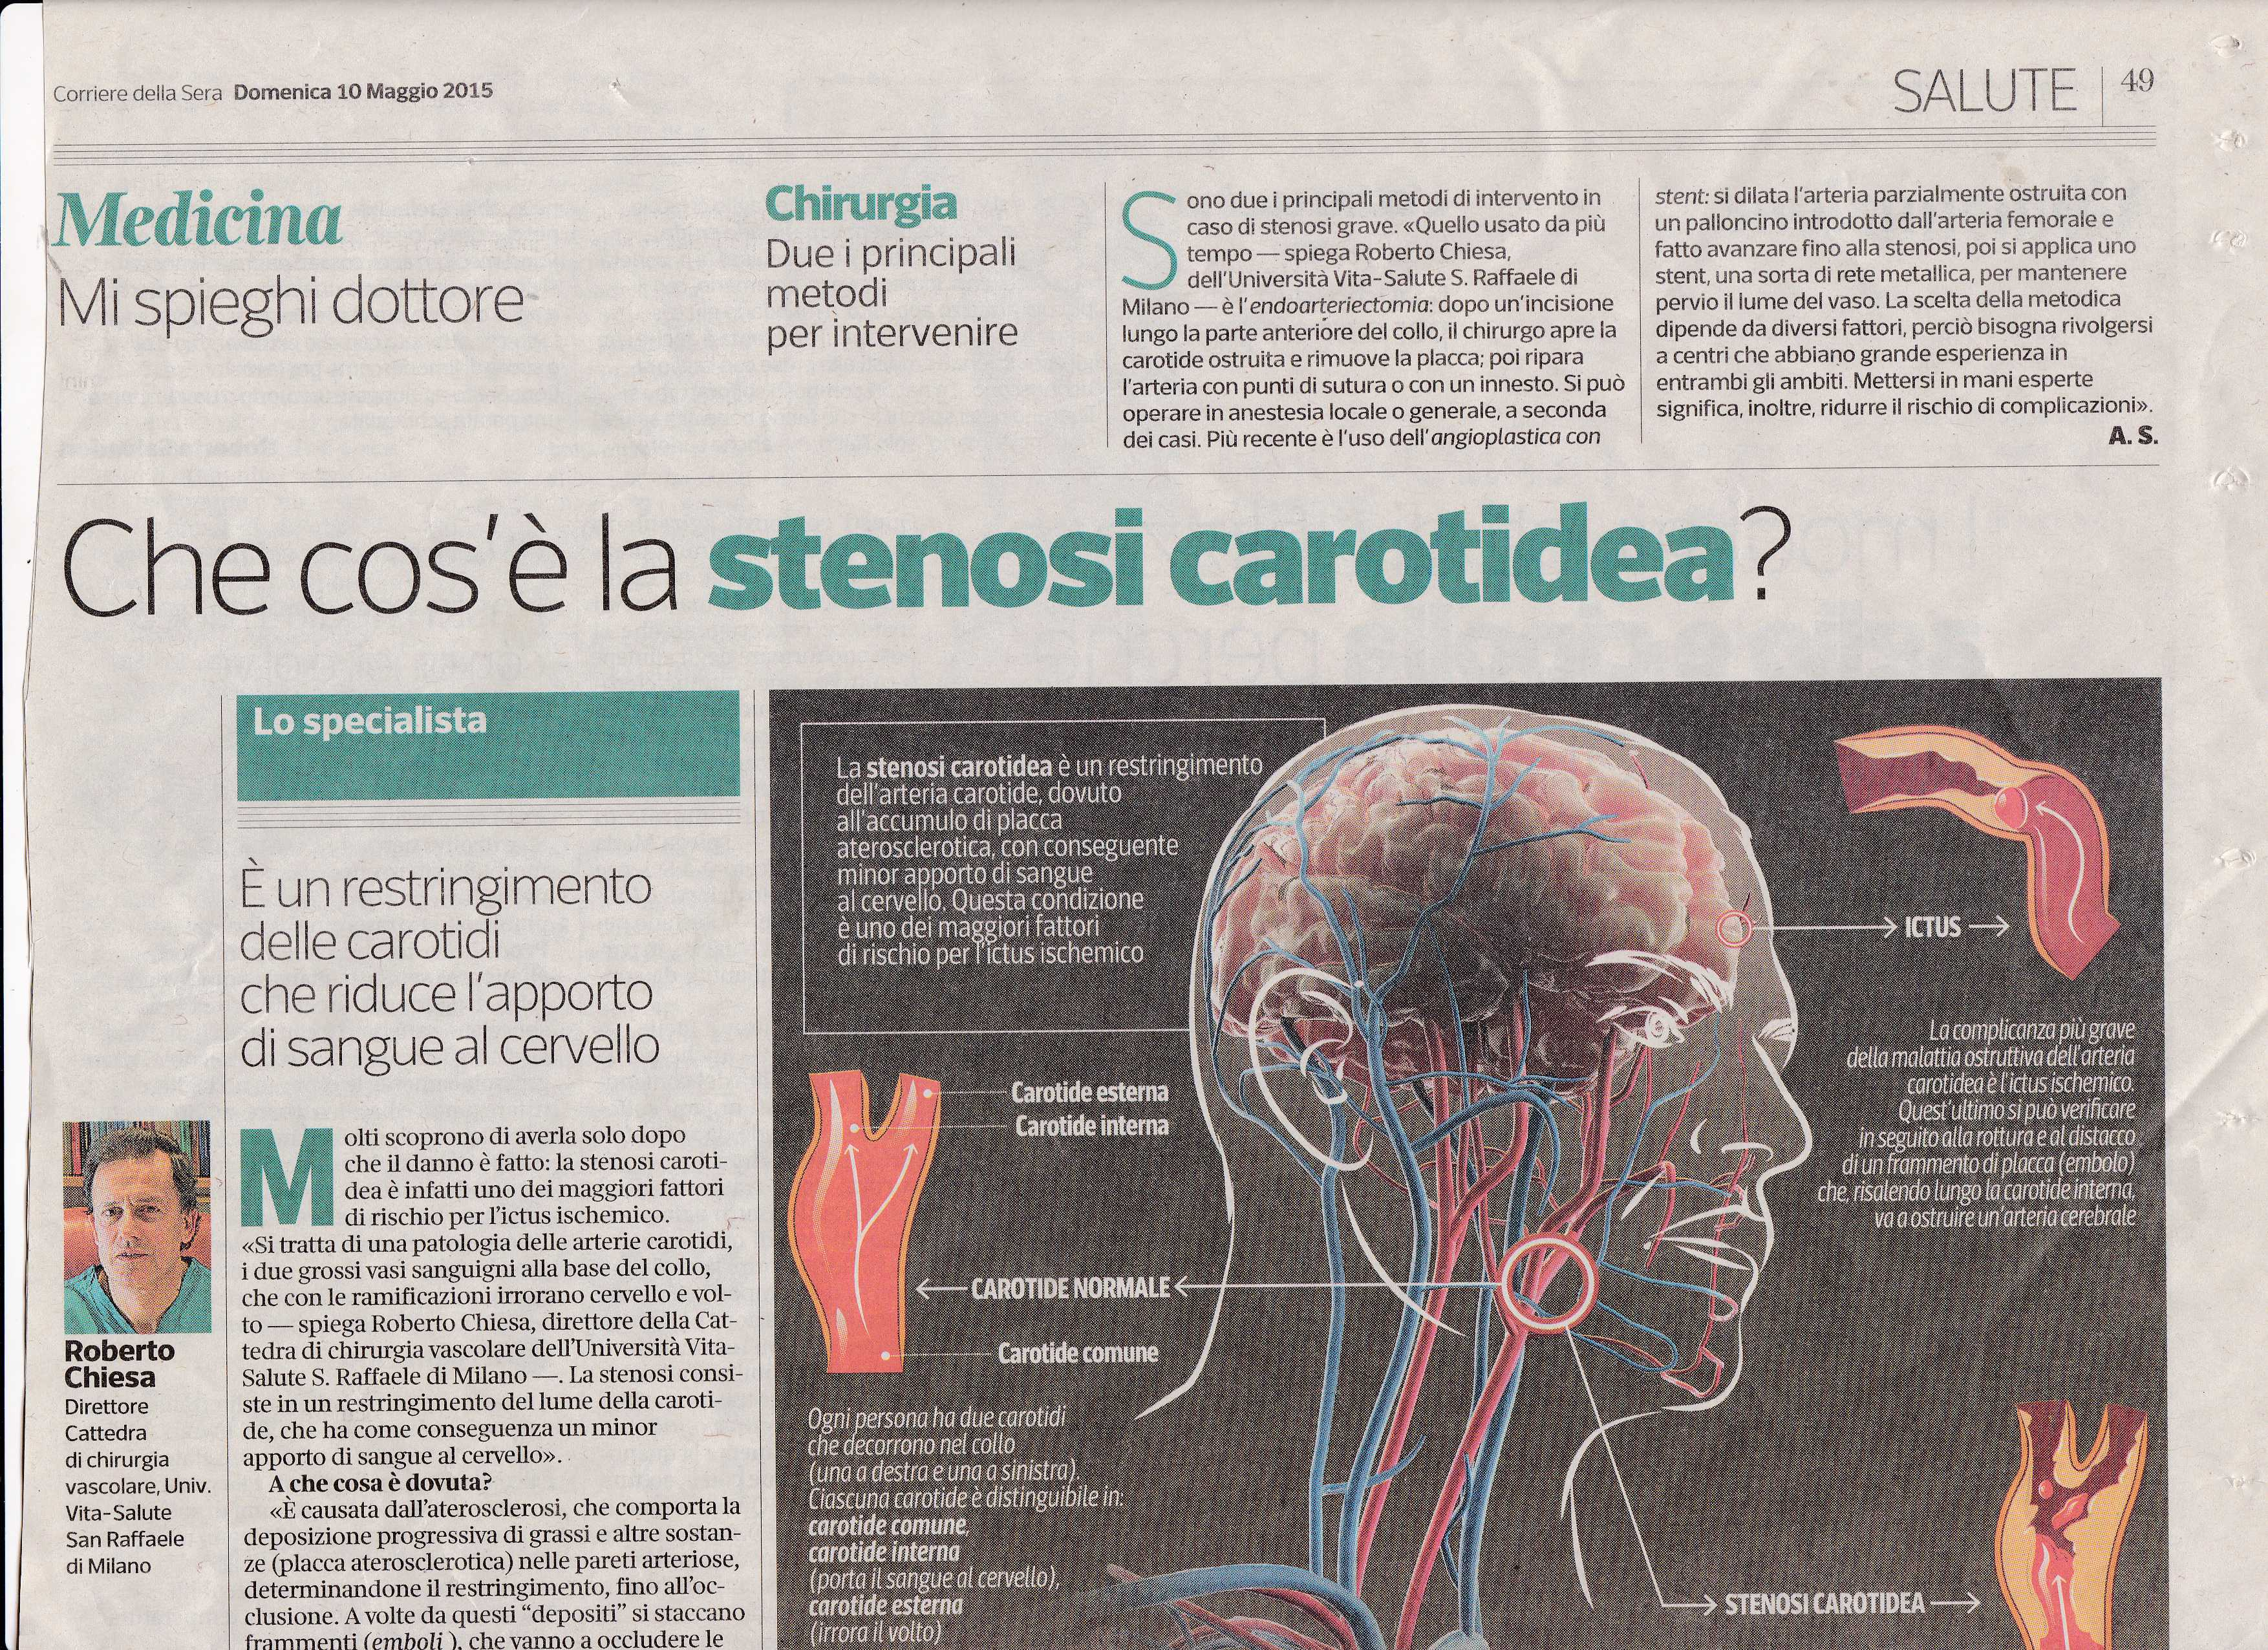 stenosi carotidea2136